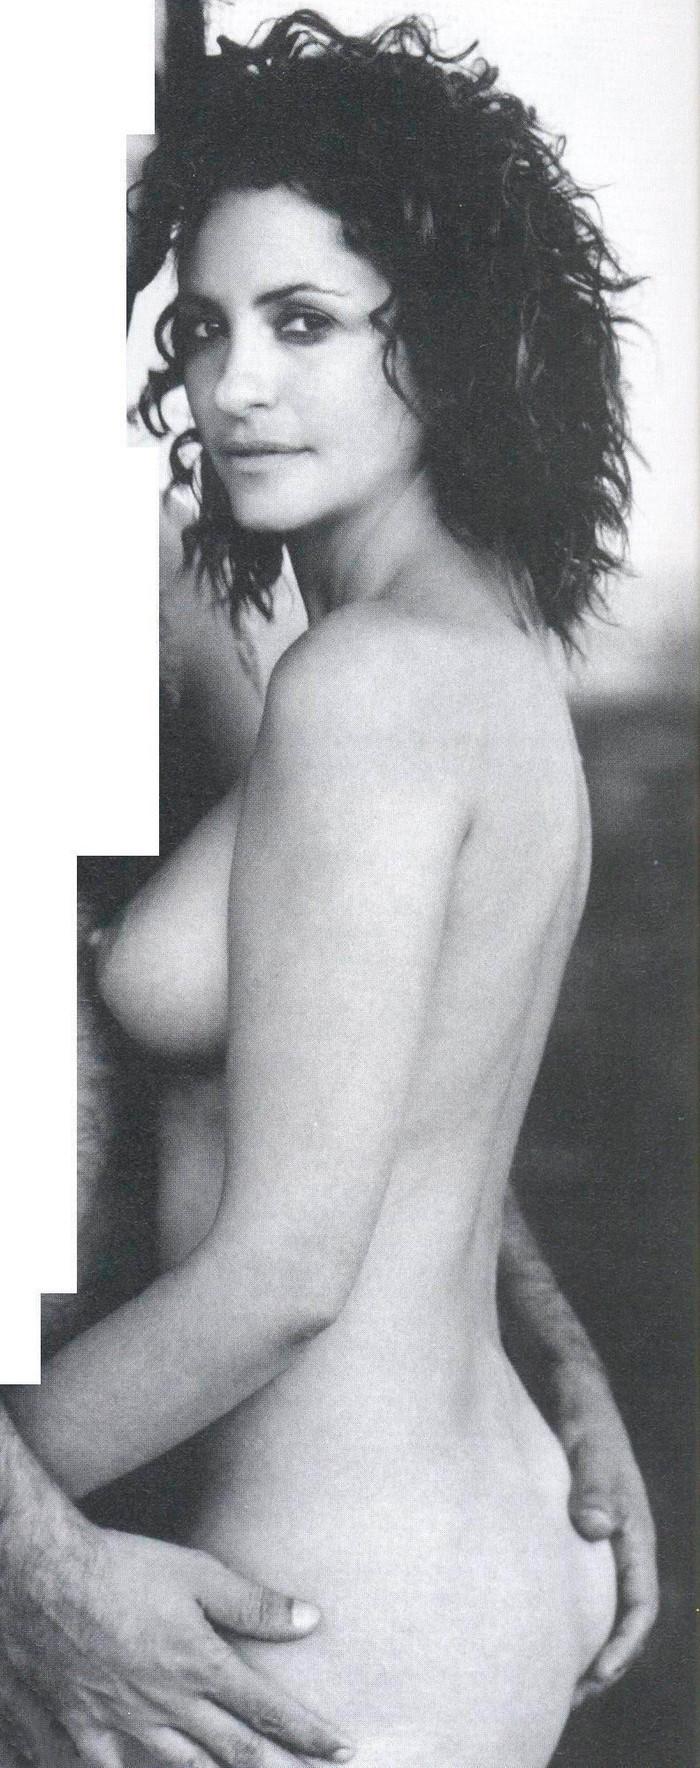 Melani olivares porno gratis Melani Olivares Desnuda Paz Escena De Cama Jaquemateateos